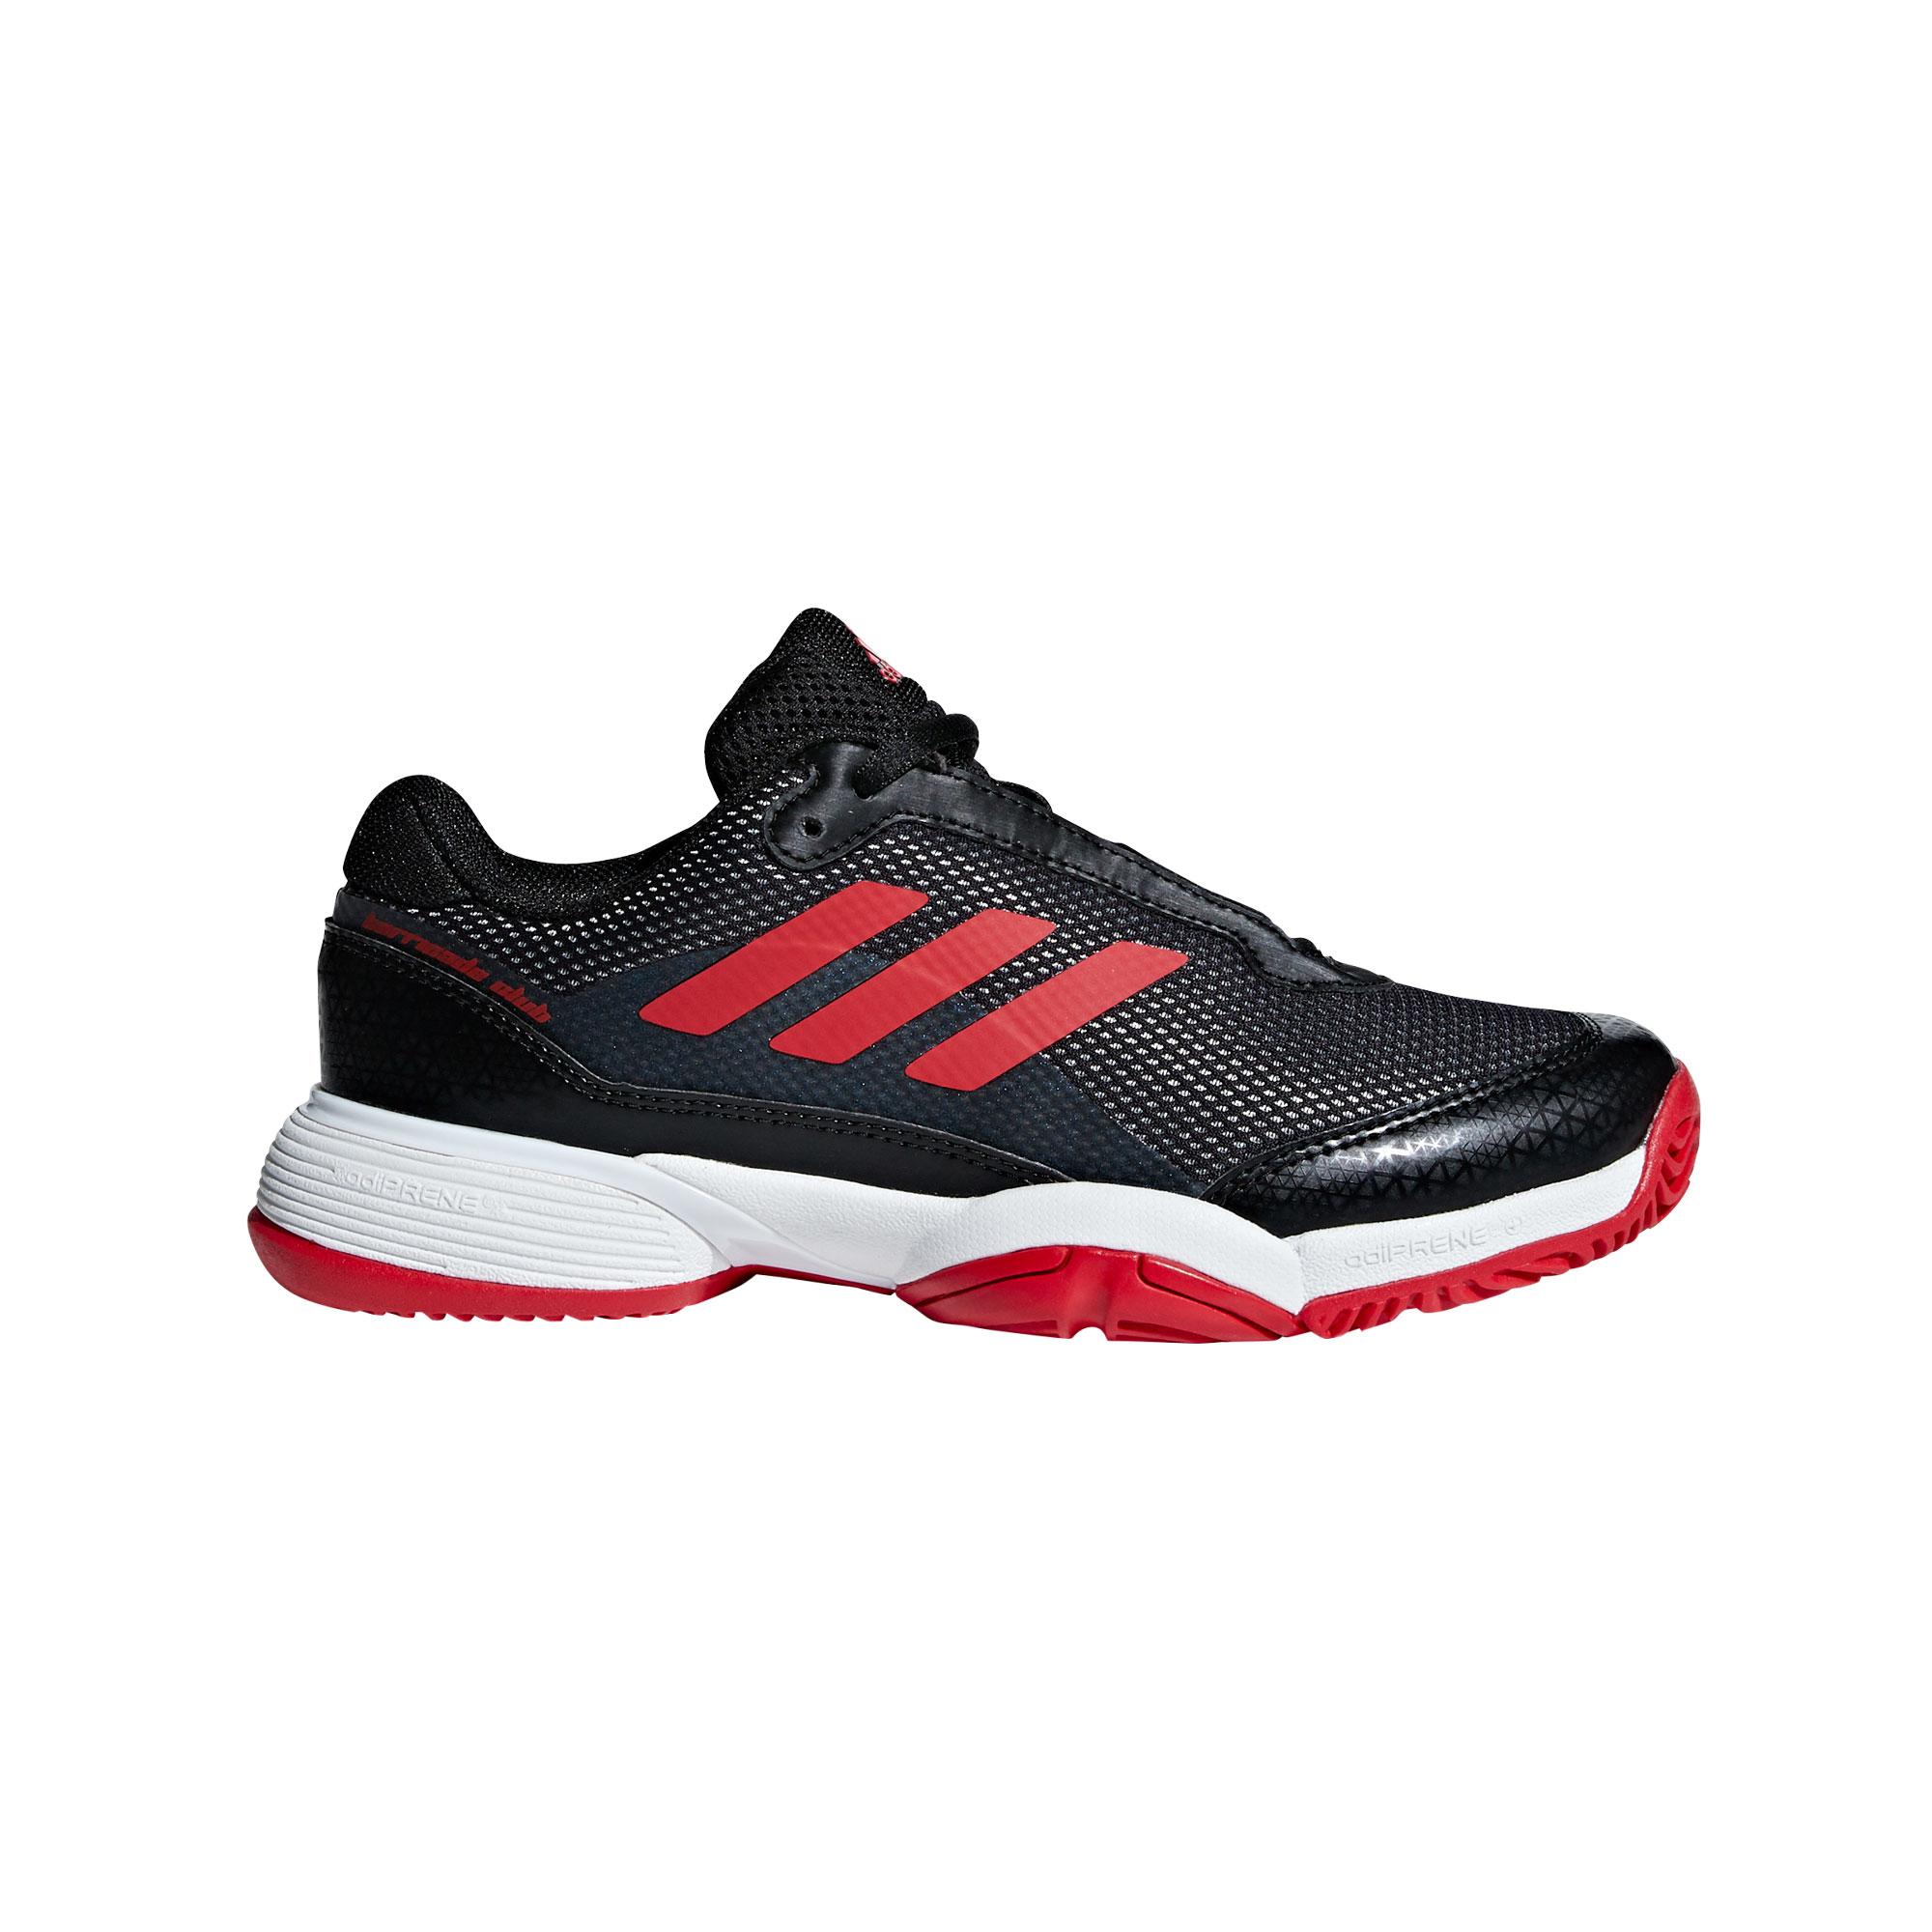 Afbeelding van Adidas Barricade Club BB7935 Tennisschoenen Junior Core Black Scarlet Footwear White